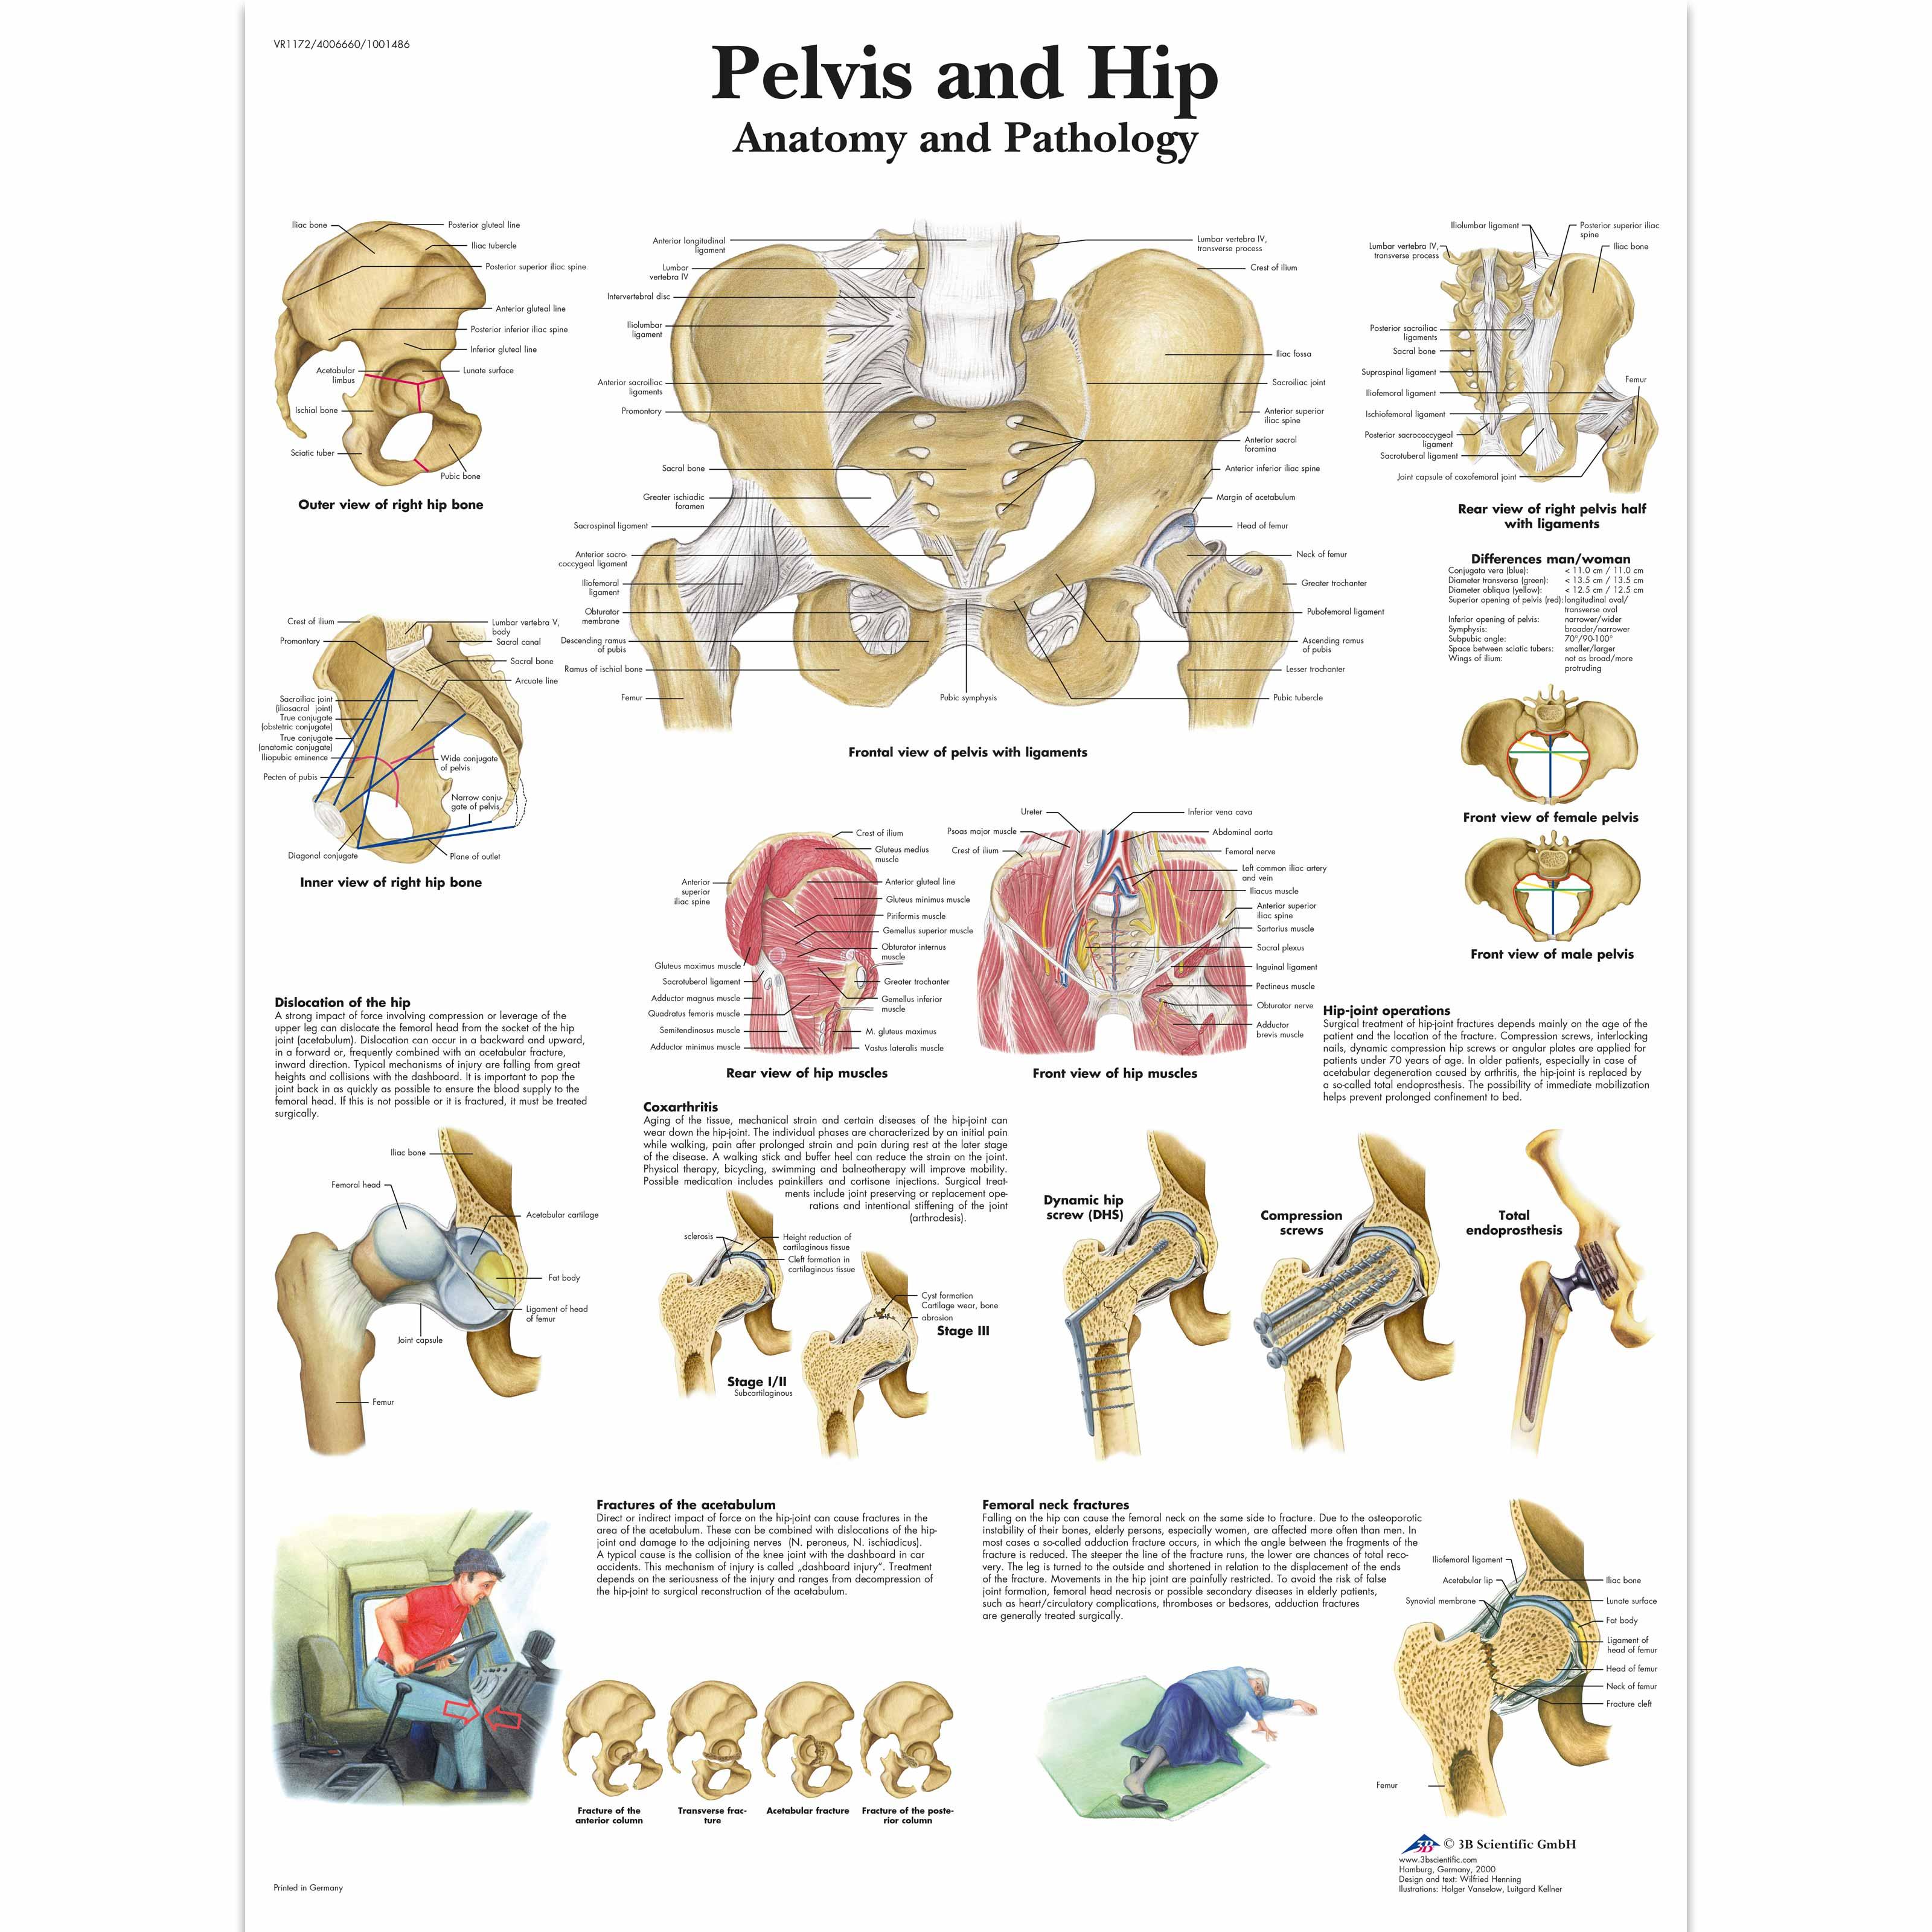 Pelvis And Hip Chart Anatomy And Pathology 1001486 Vr1172l